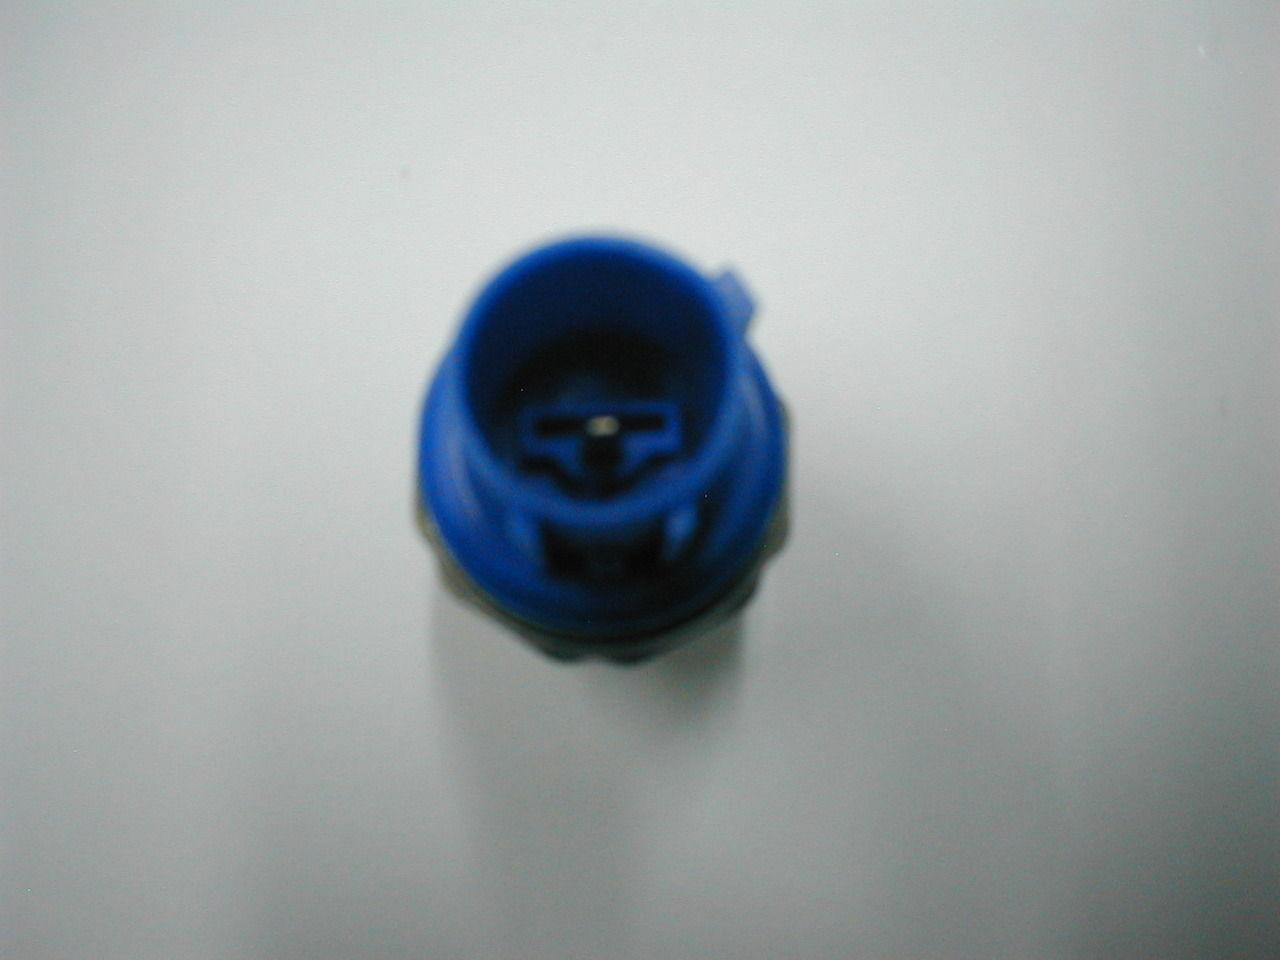 1996 2000 Honda Civic Knock Sensor And 50 Similar Items Location